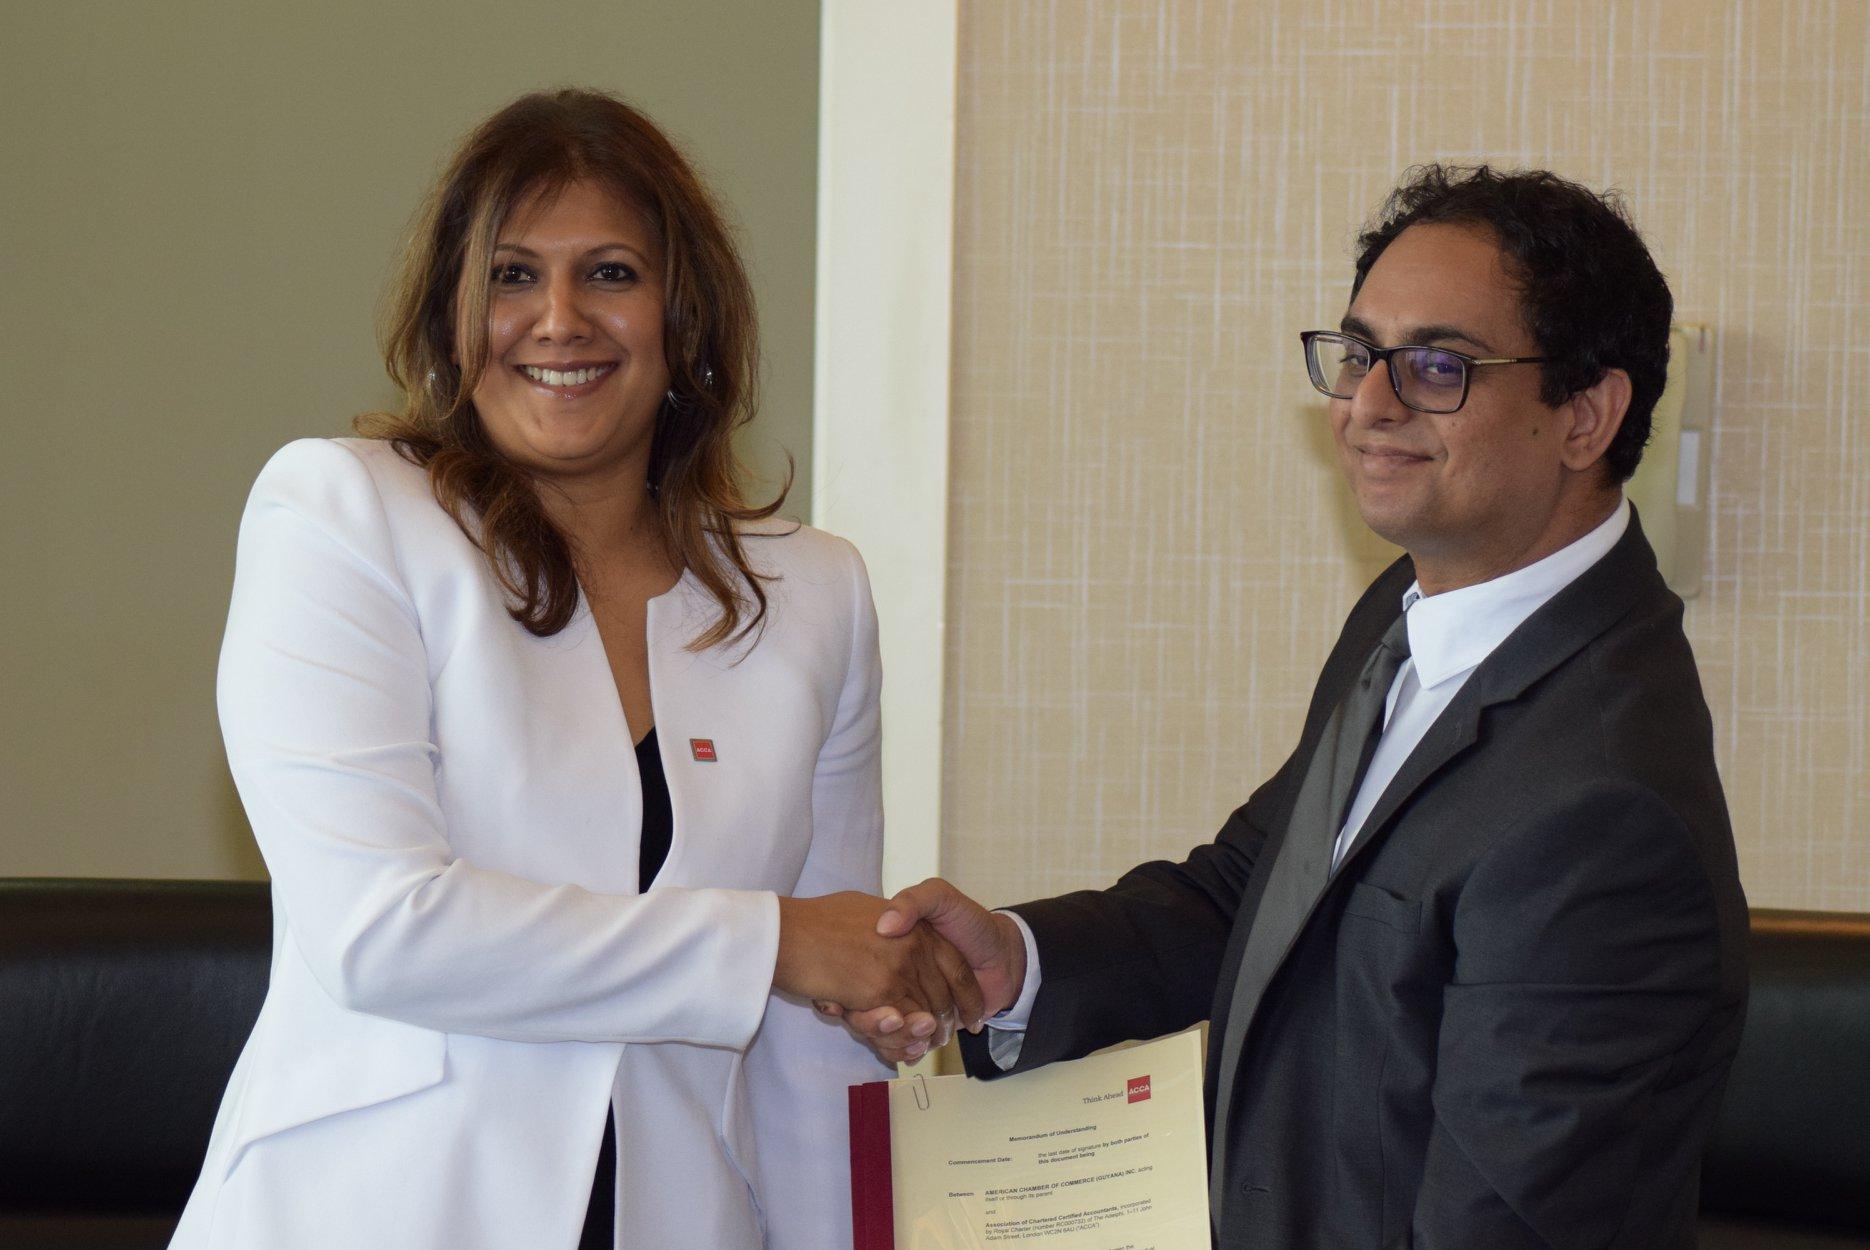 MOU Signing – AMCHAM Guyana Inc. and ACCA Caribbean